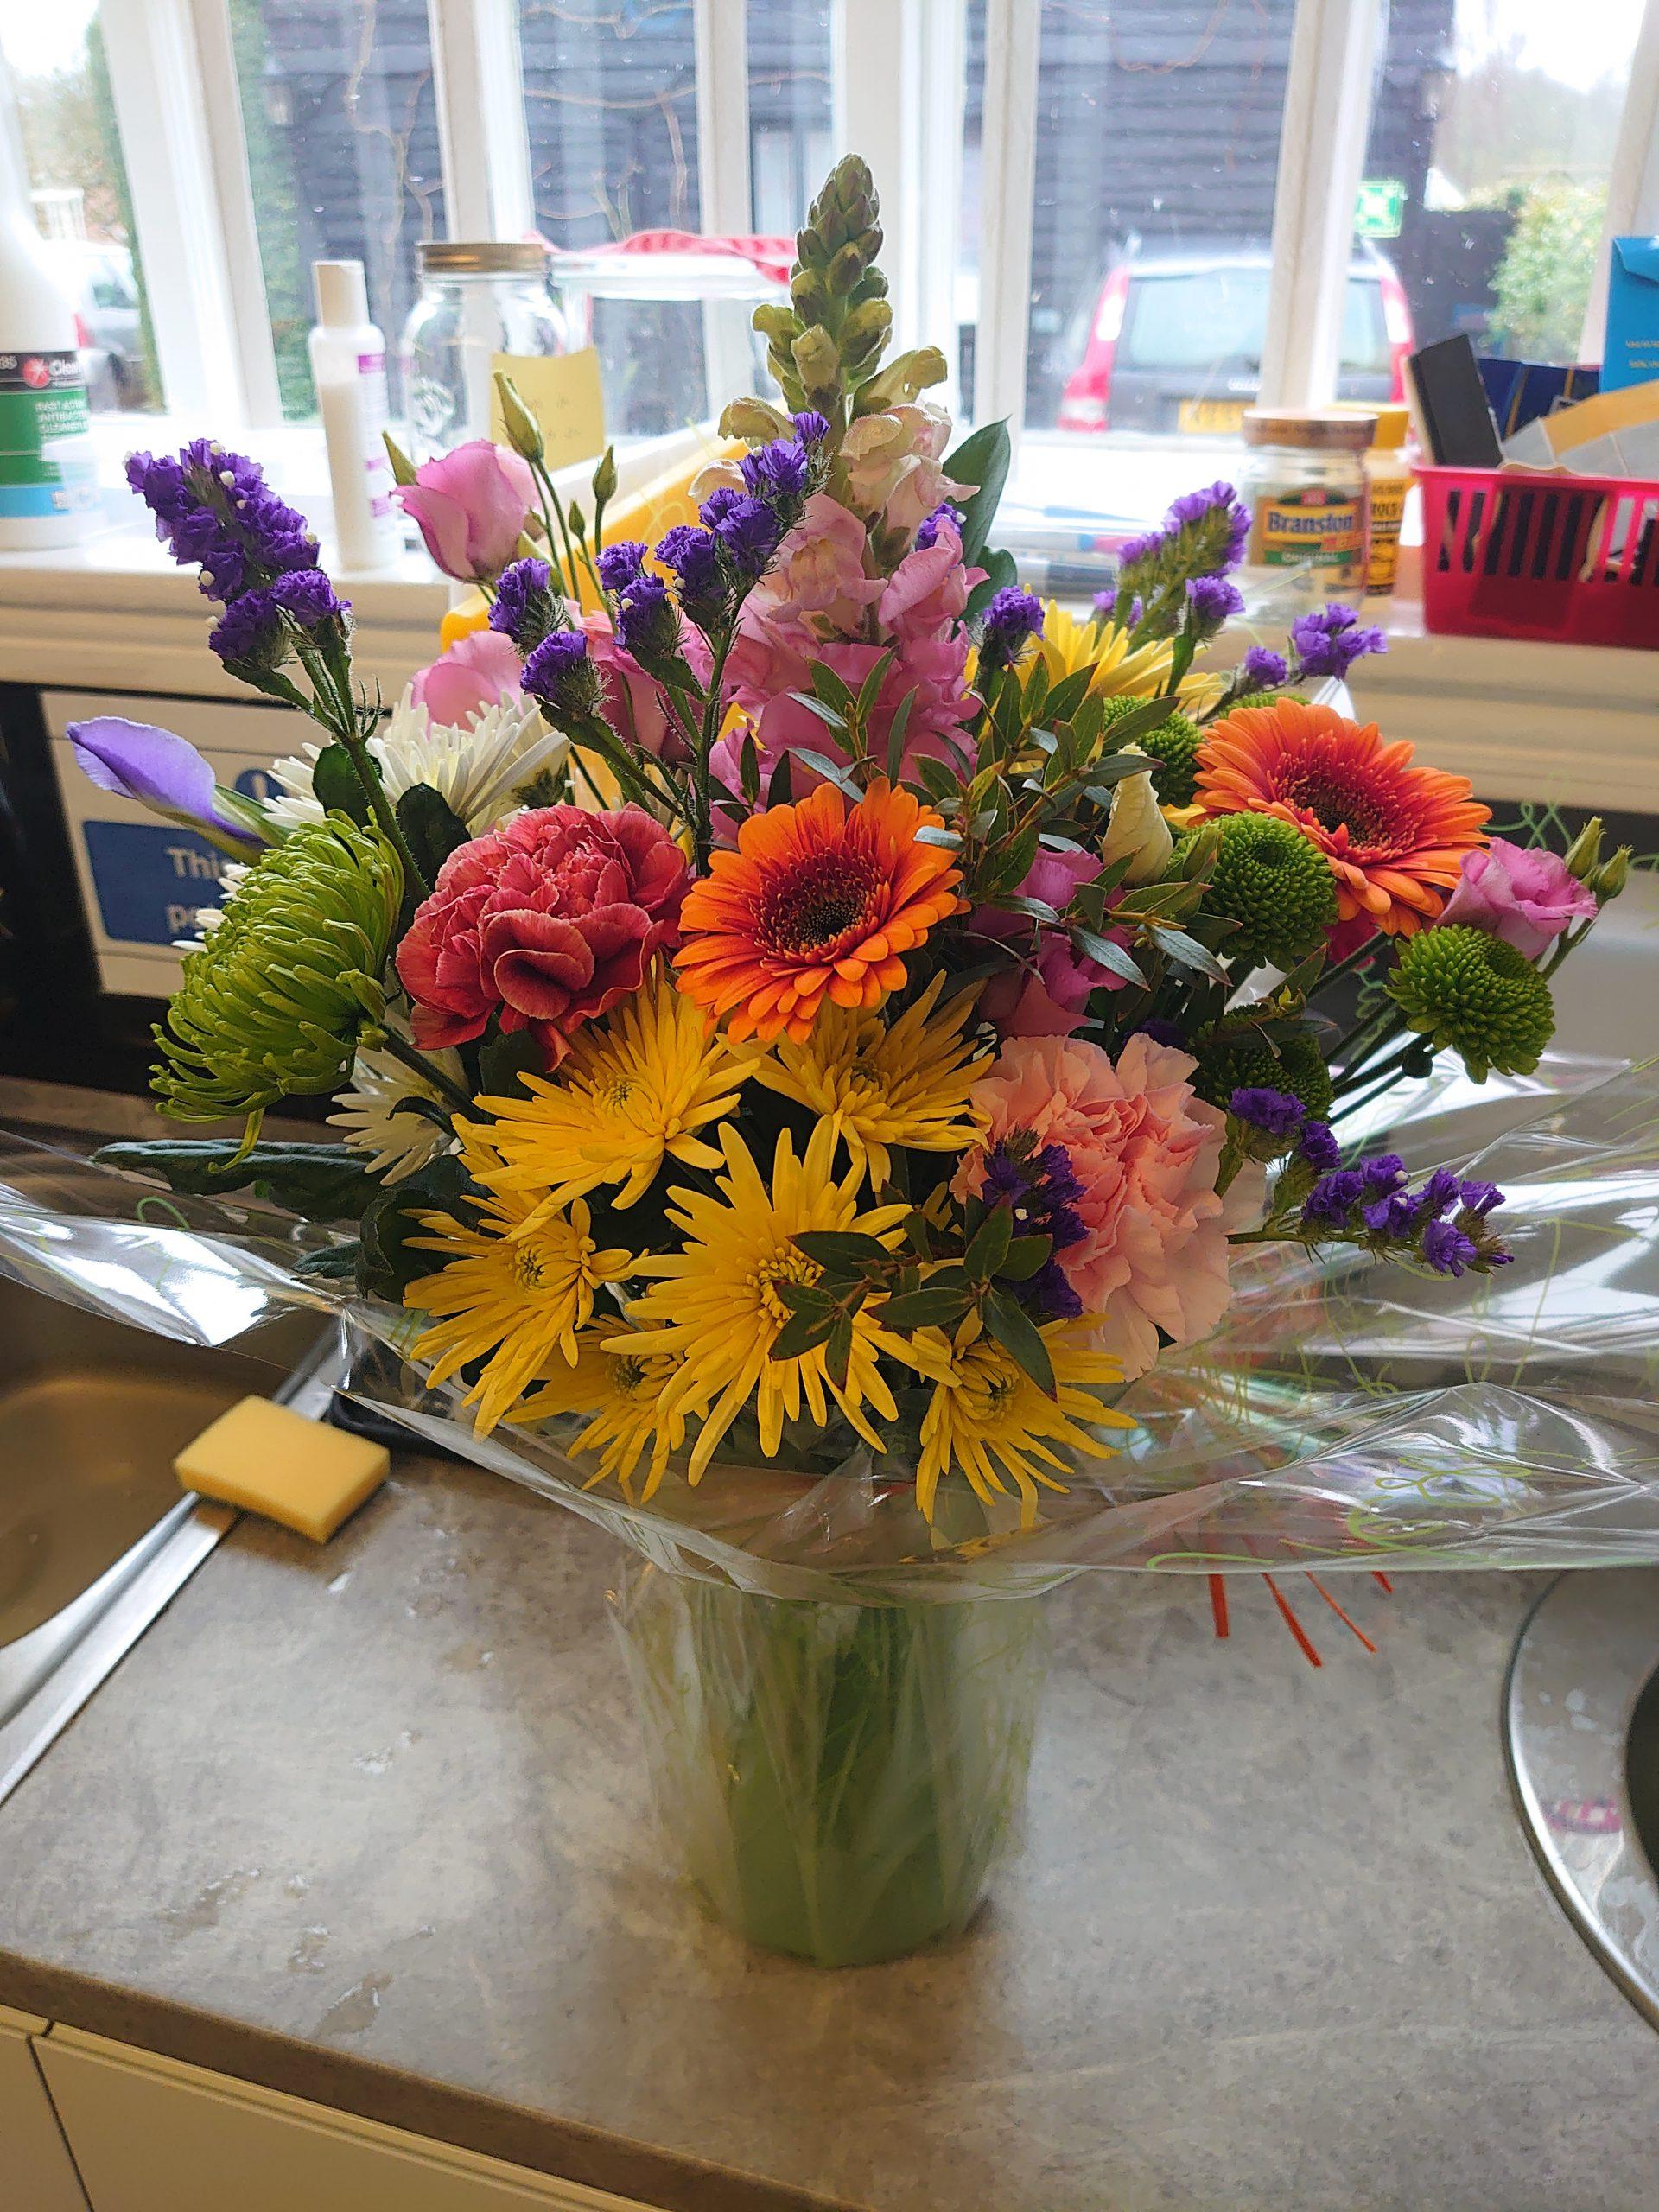 Judiths flowers